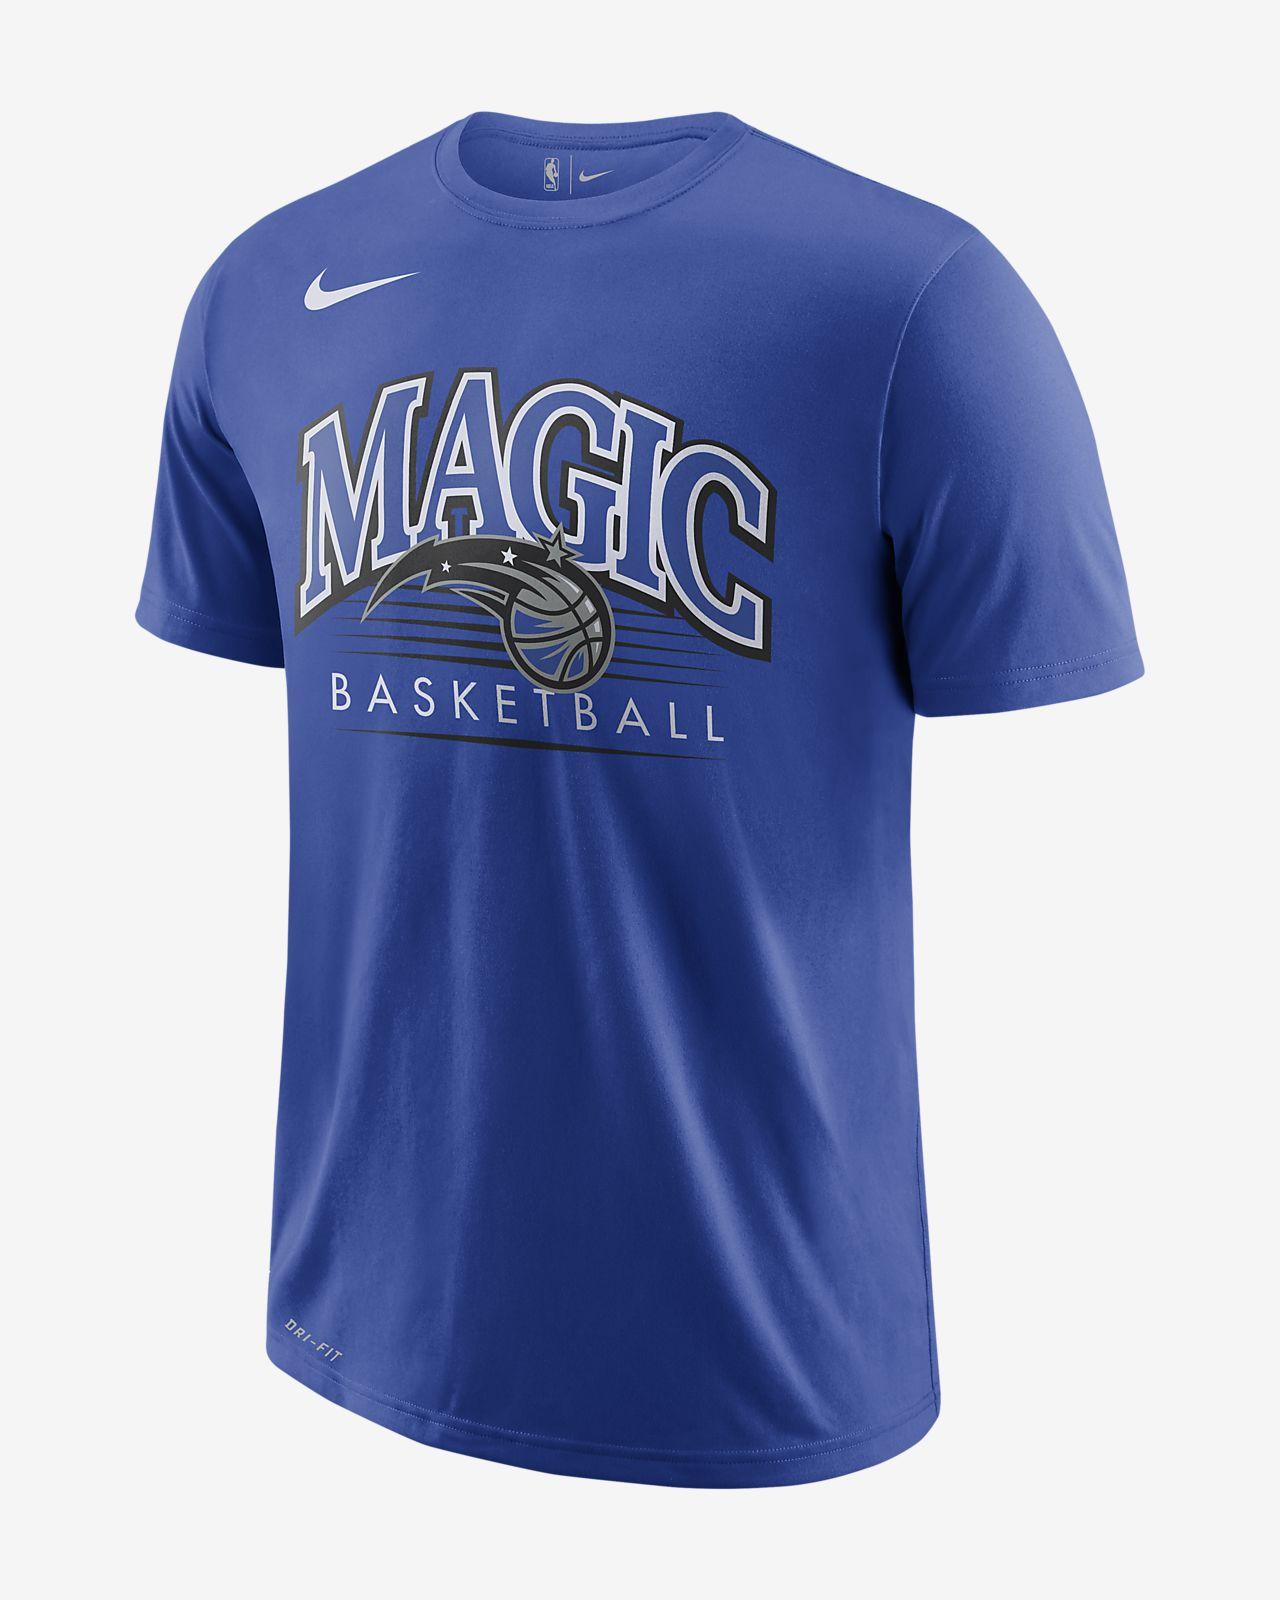 161fdcceab633 Orlando Magic Nike Dri-FIT Men s NBA T-Shirt. Nike.com GB